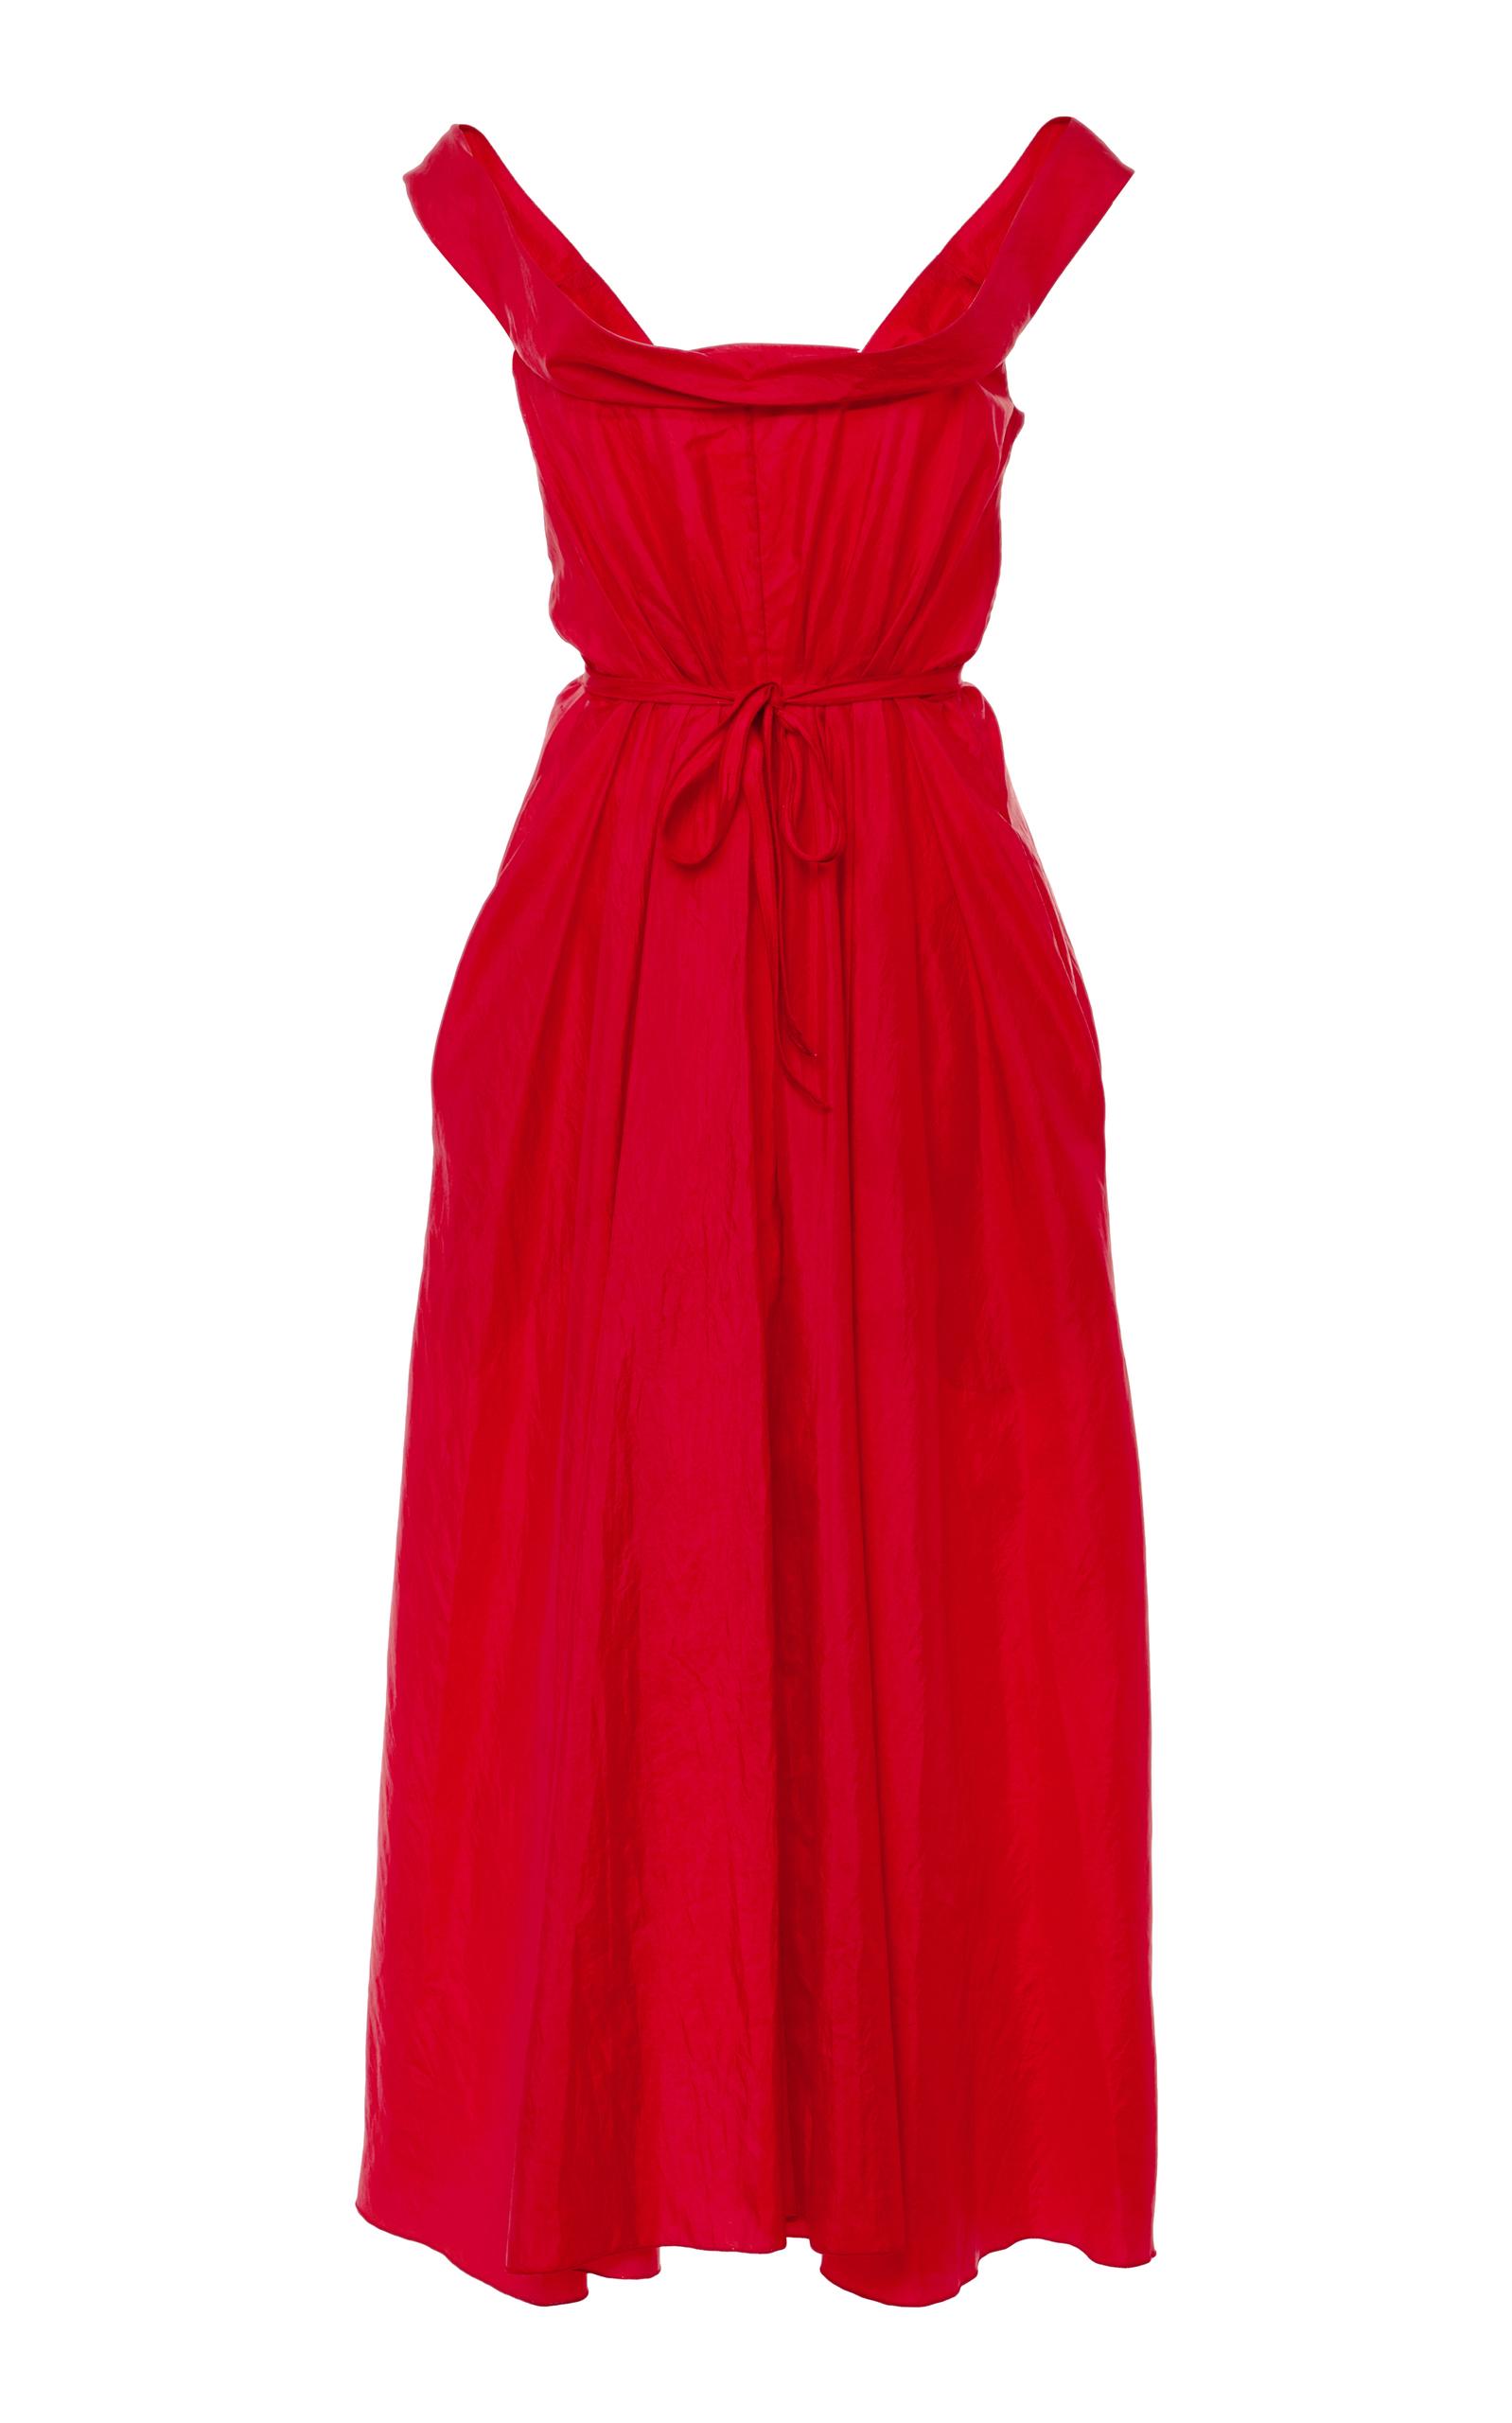 BROCK COLLECTION Davi Off-The-Shoulder Taffeta Midi Dress in Red